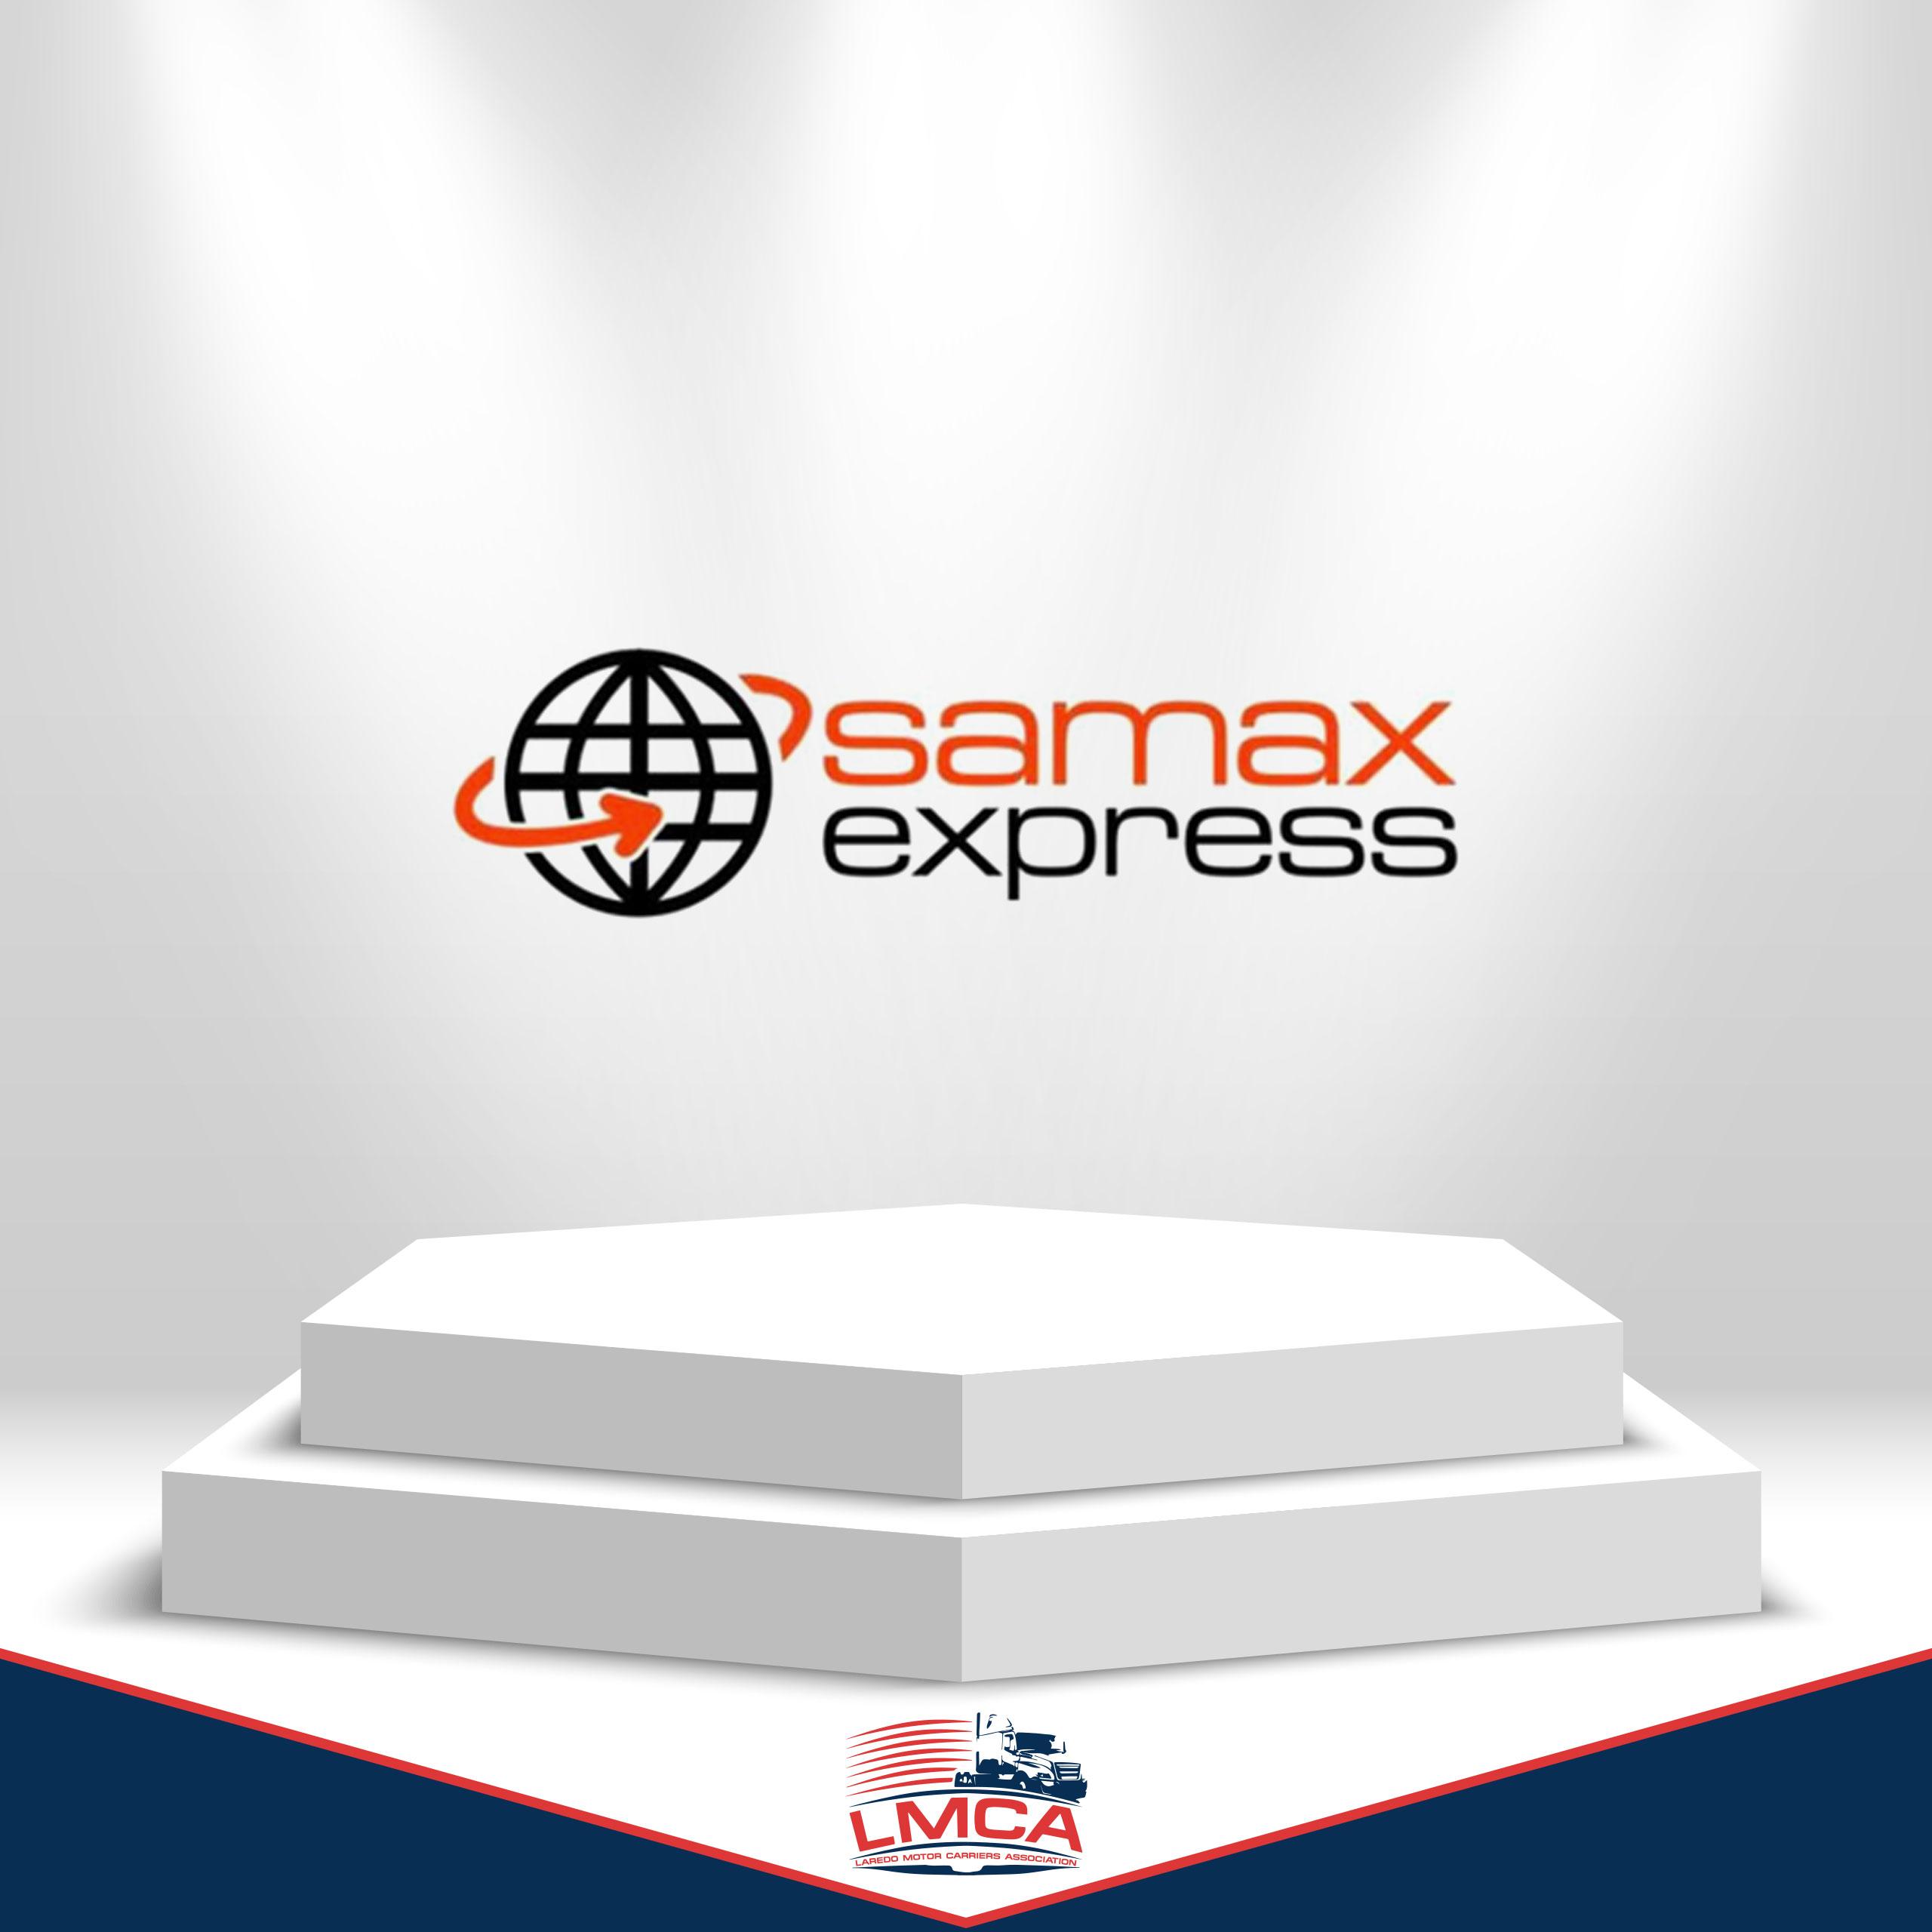 samax-lmca